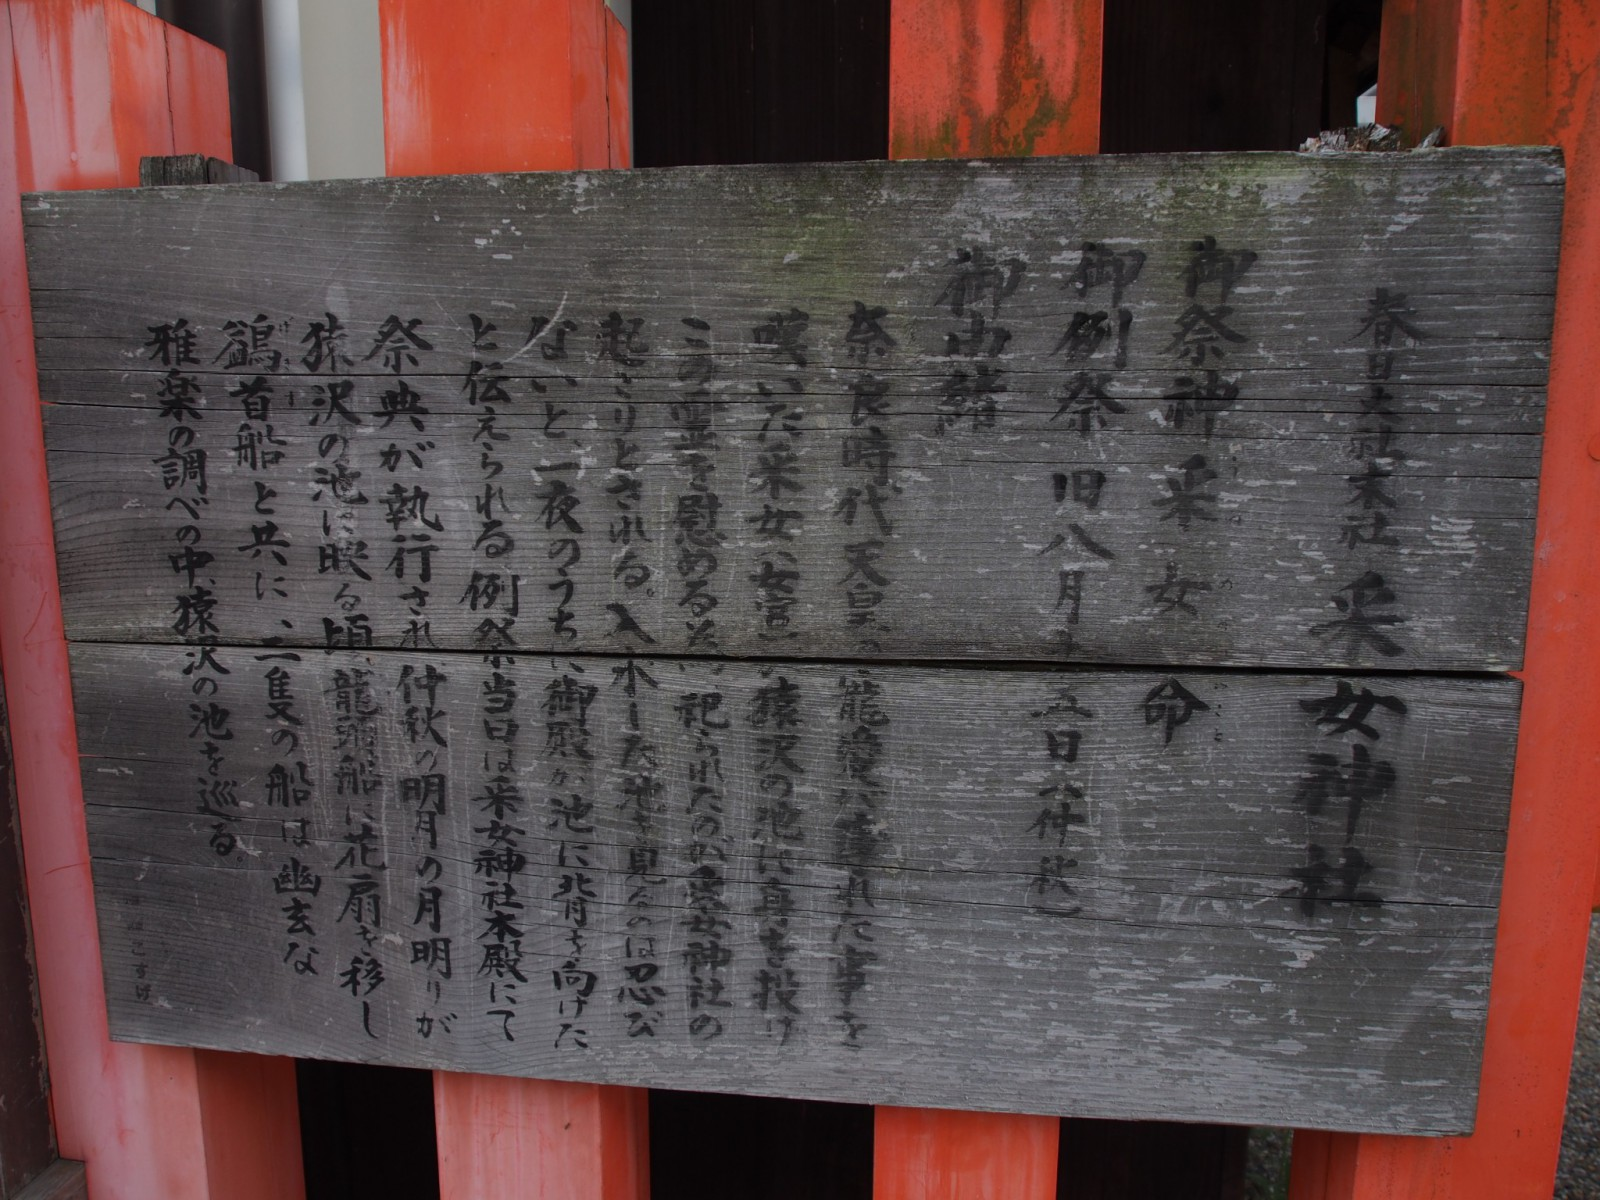 采女神社の由緒